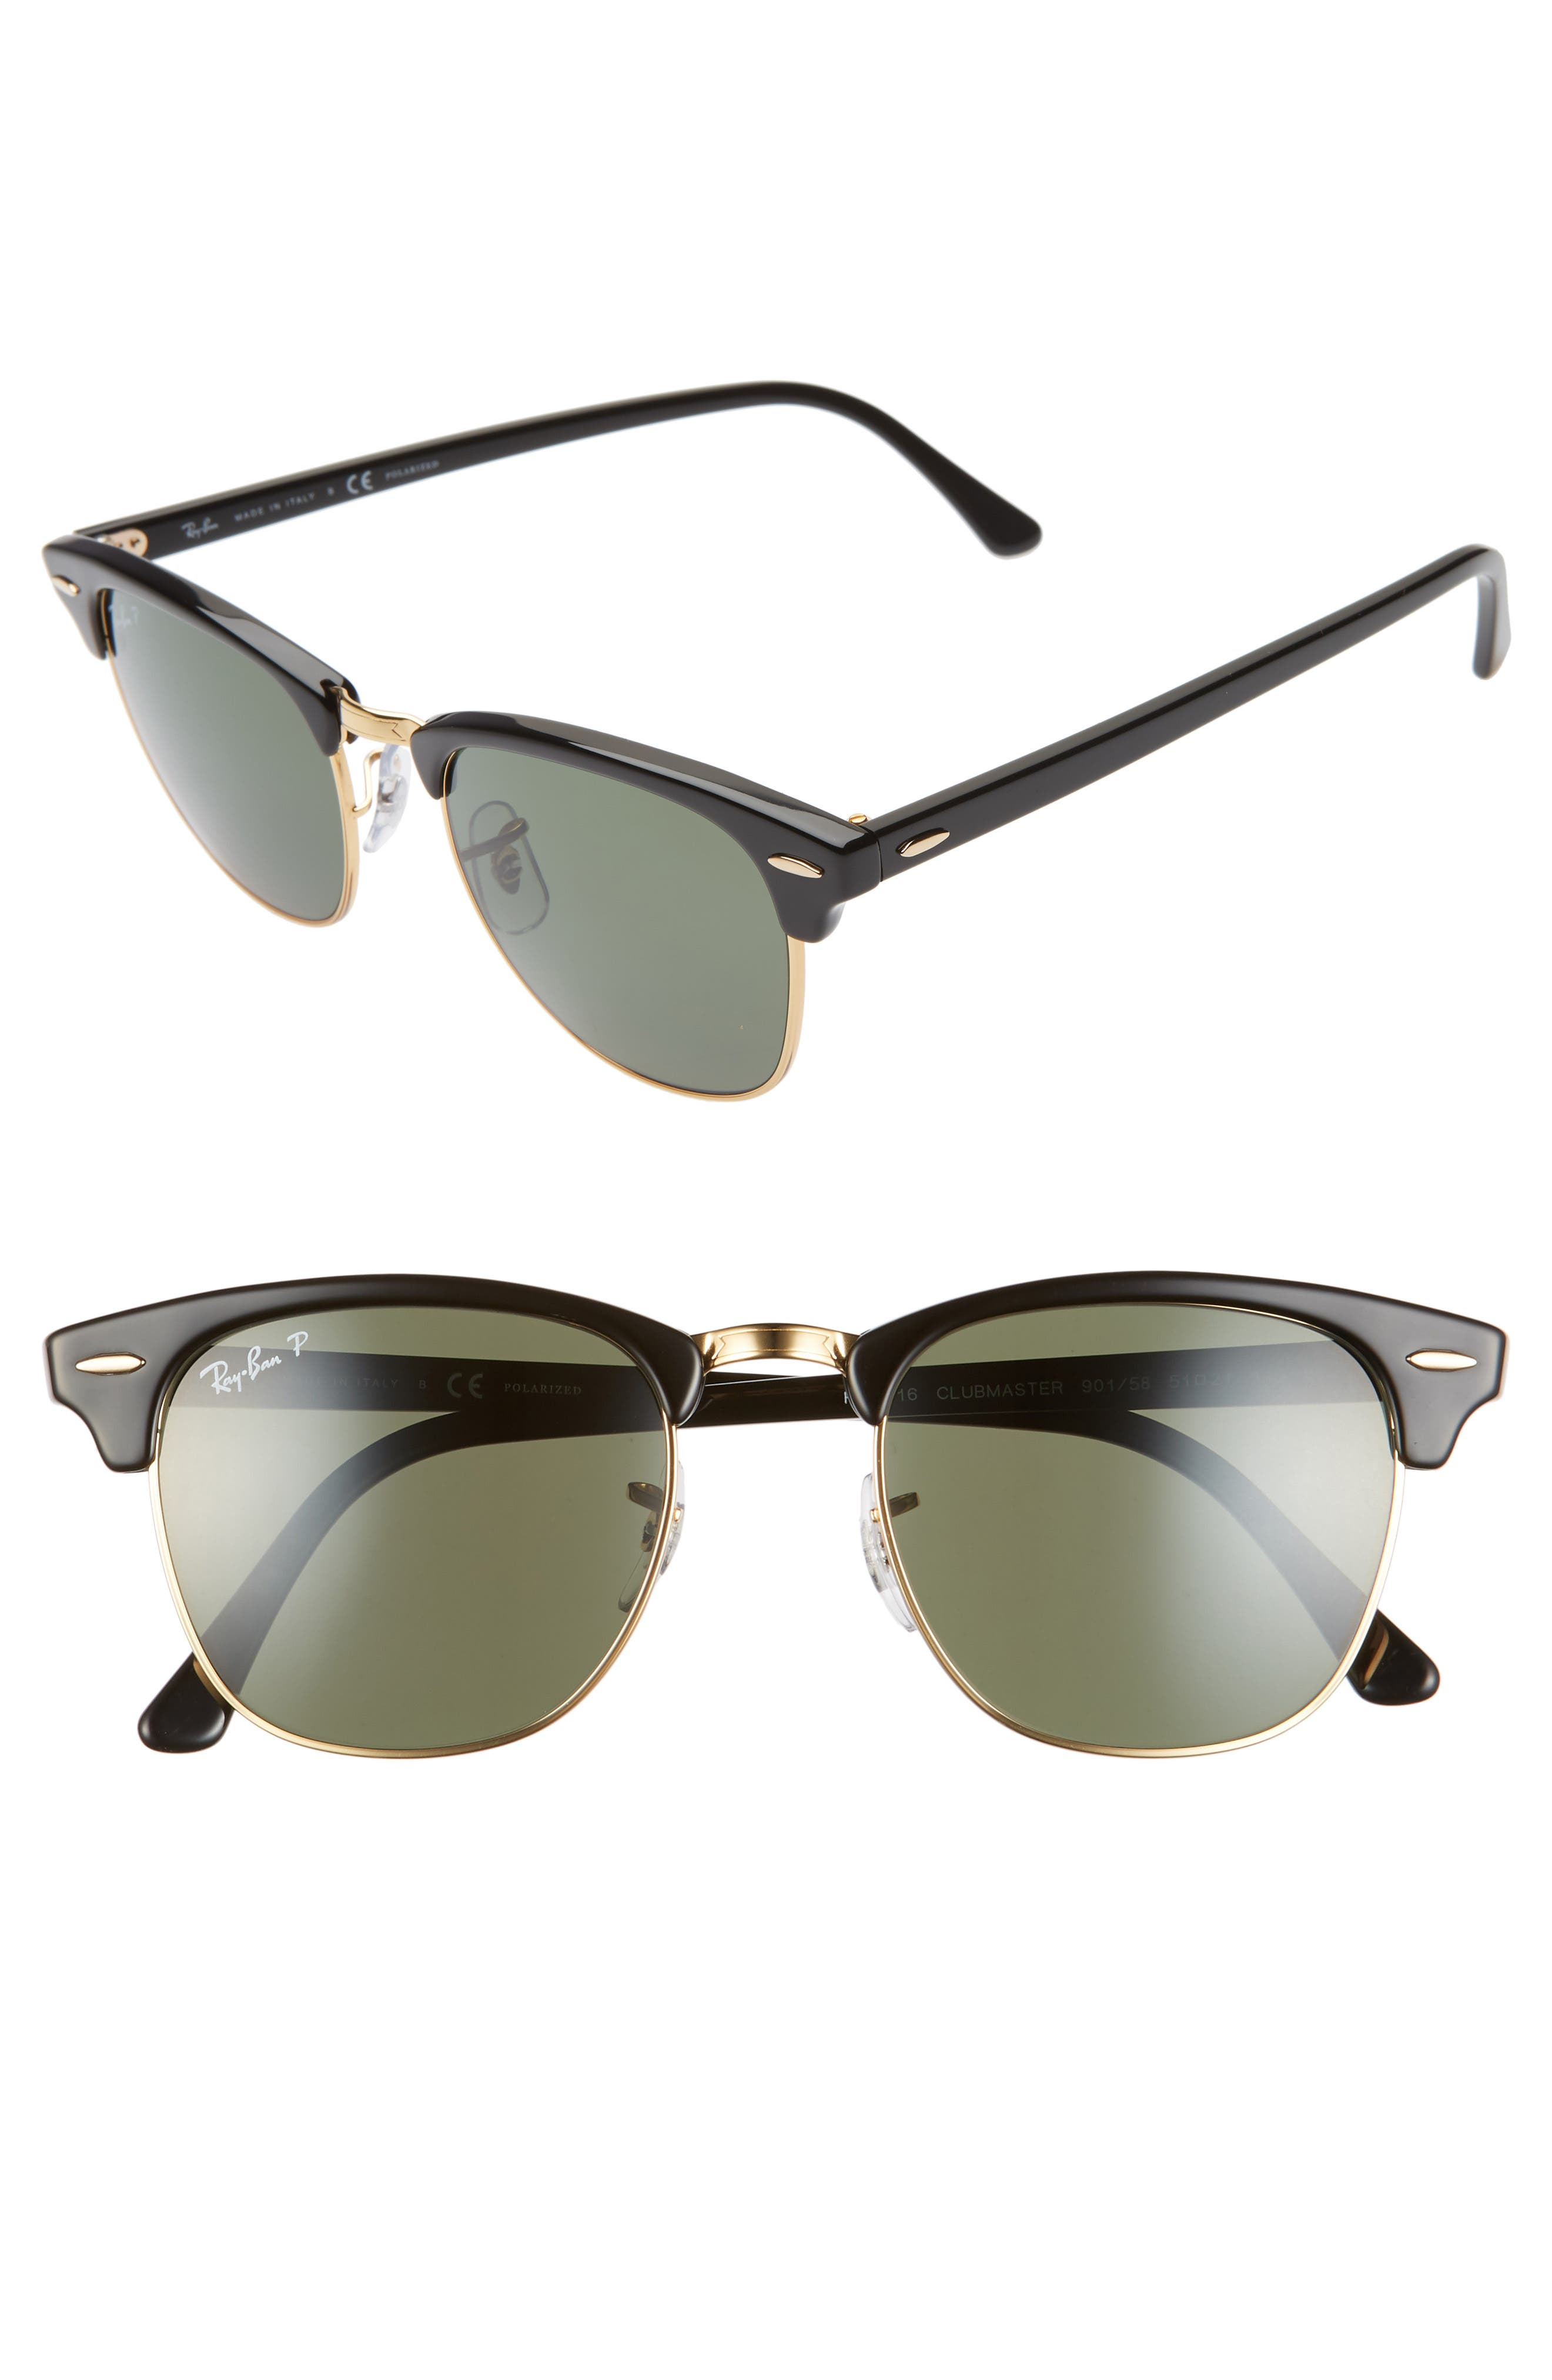 Ray-Ban Clubmaster 51Mm Polarized Sunglasses - Black